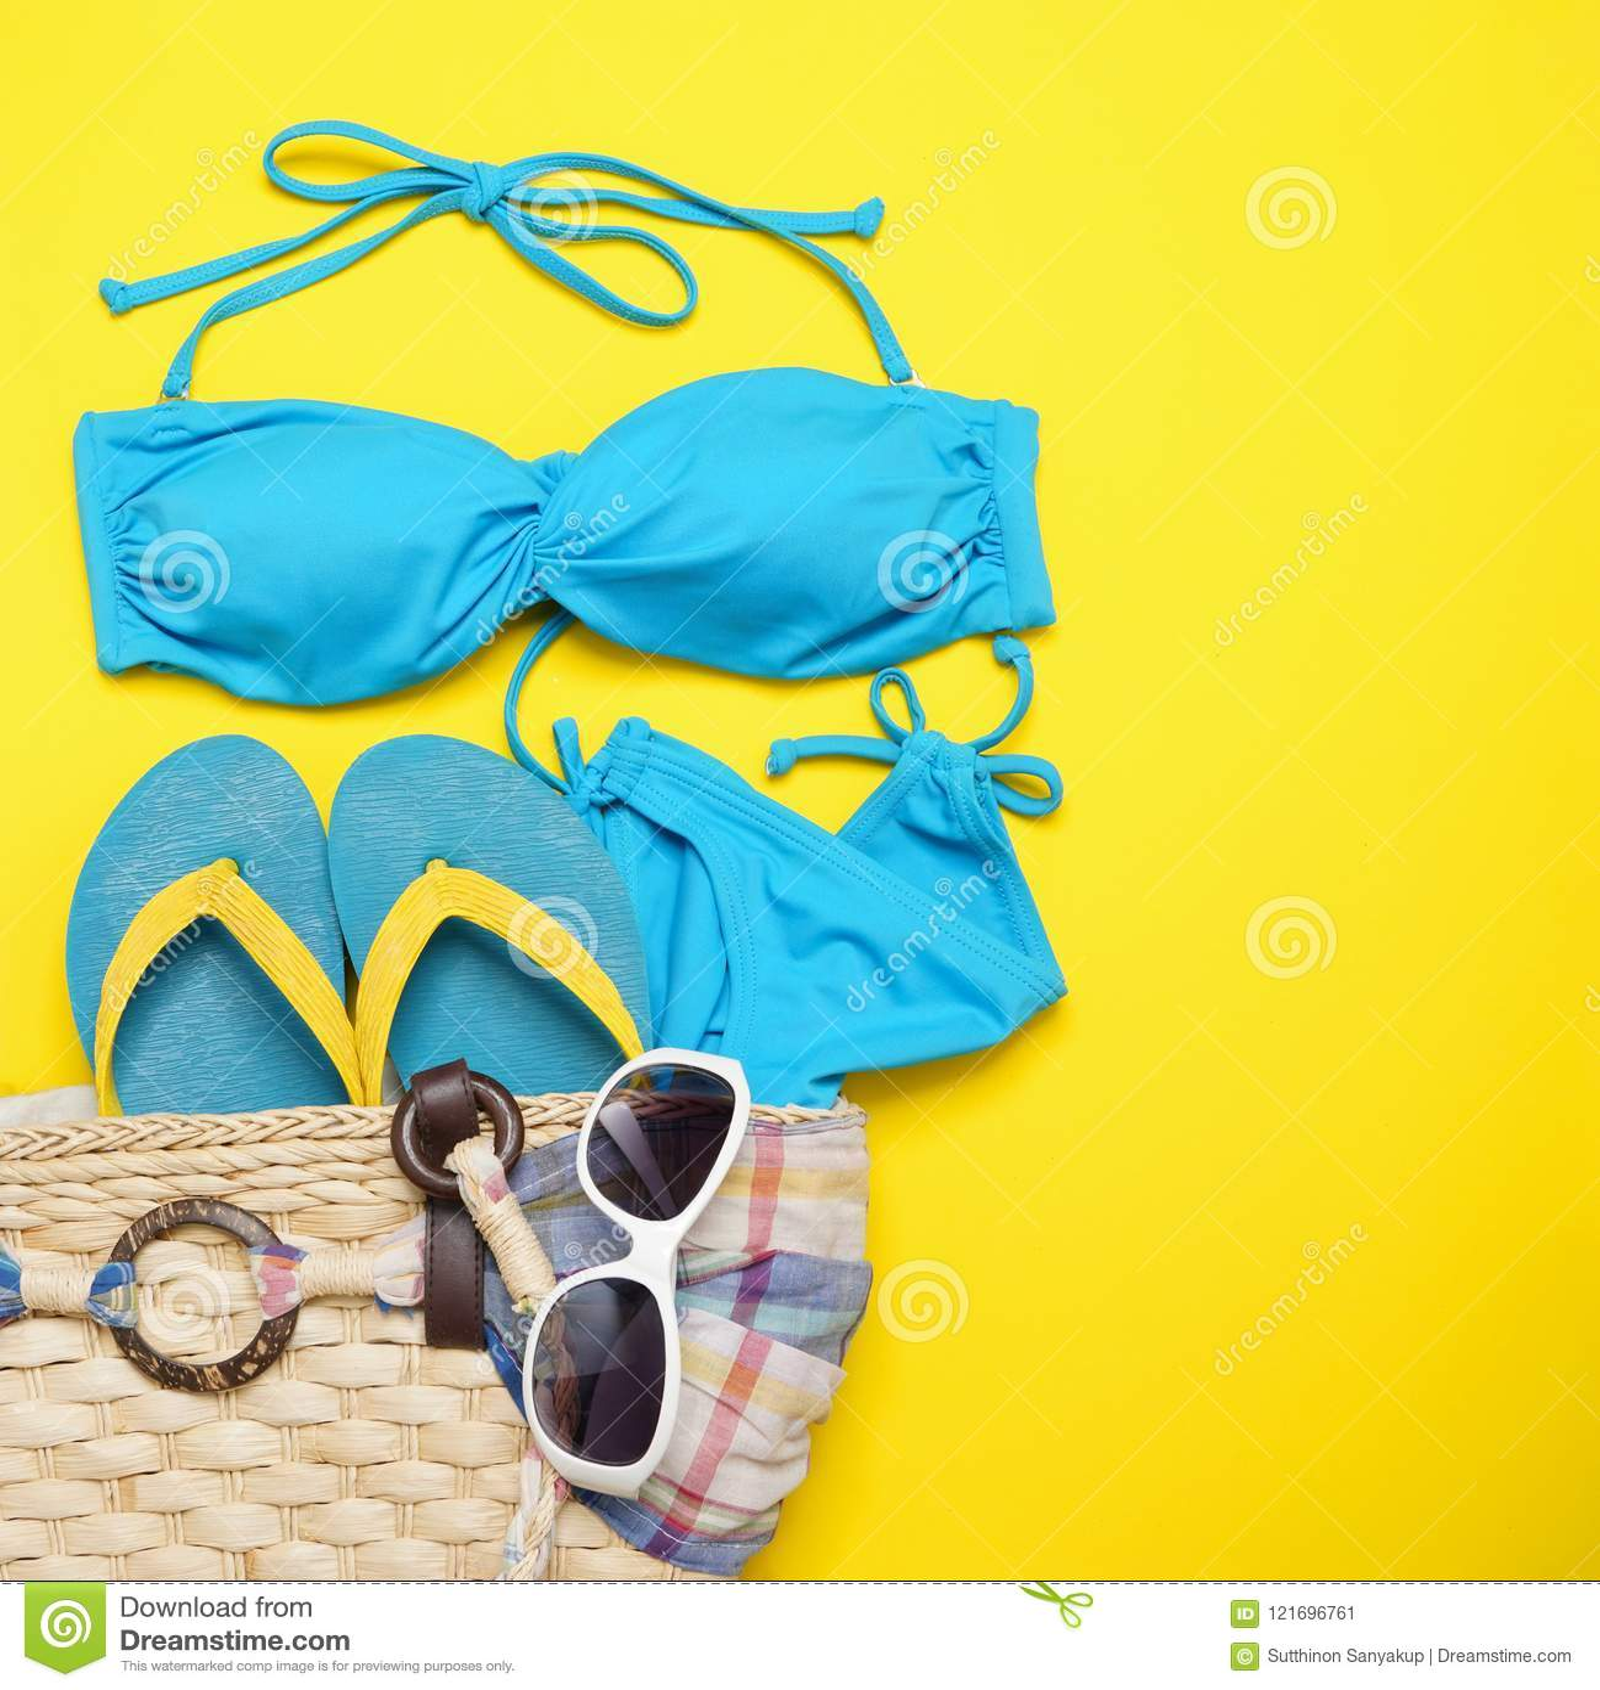 2e93857dd Beach Accessories On The Yellow Background - Sunglasses